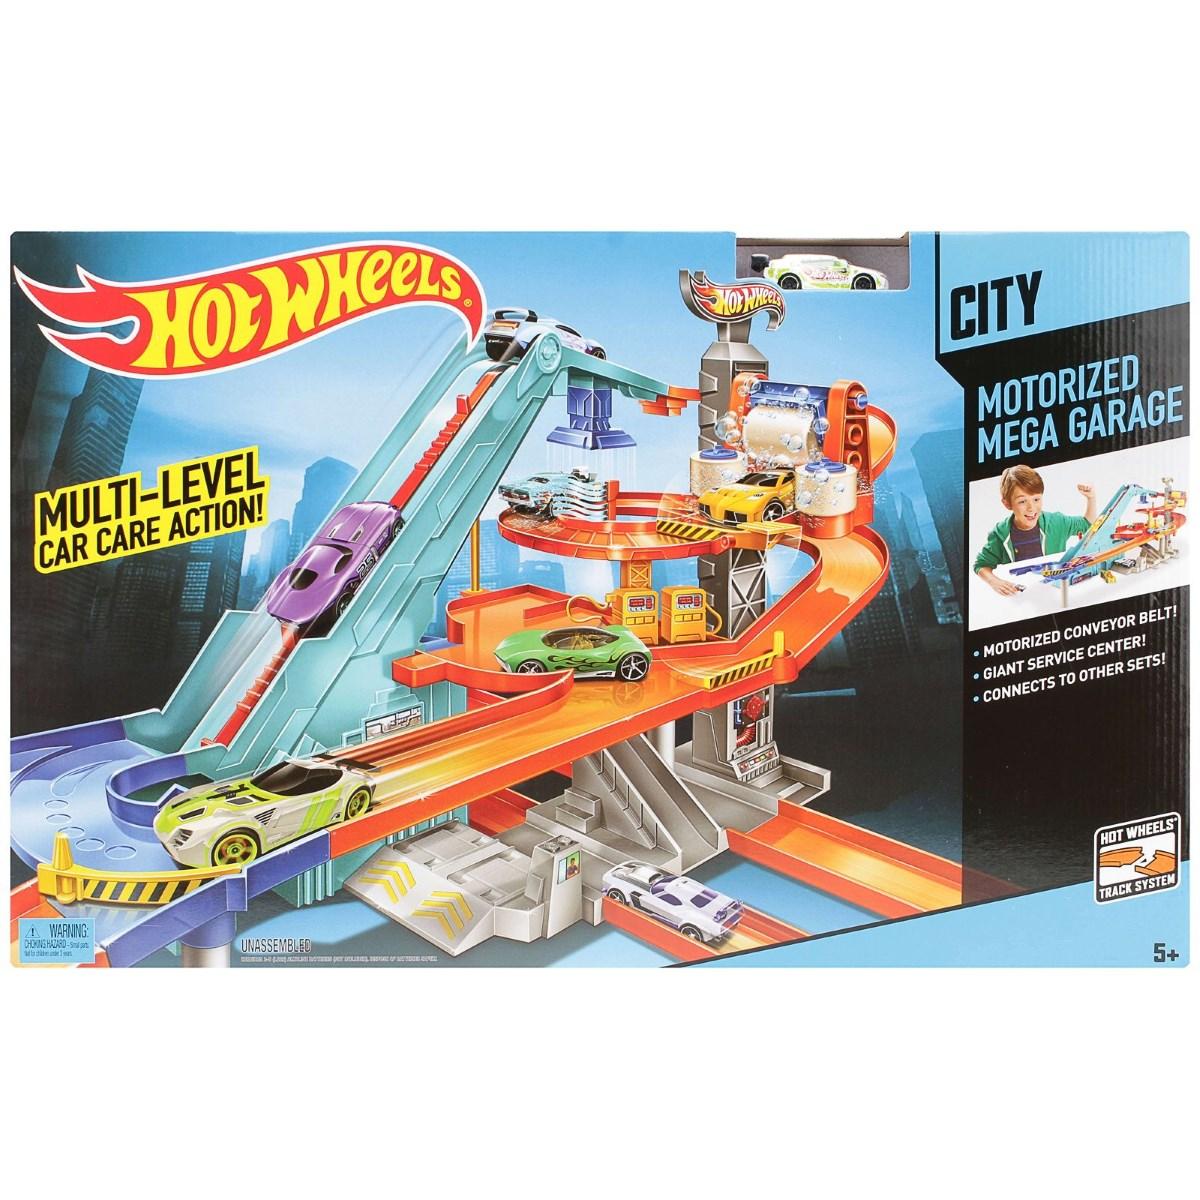 Hot Wheels Motorized Mega Garage